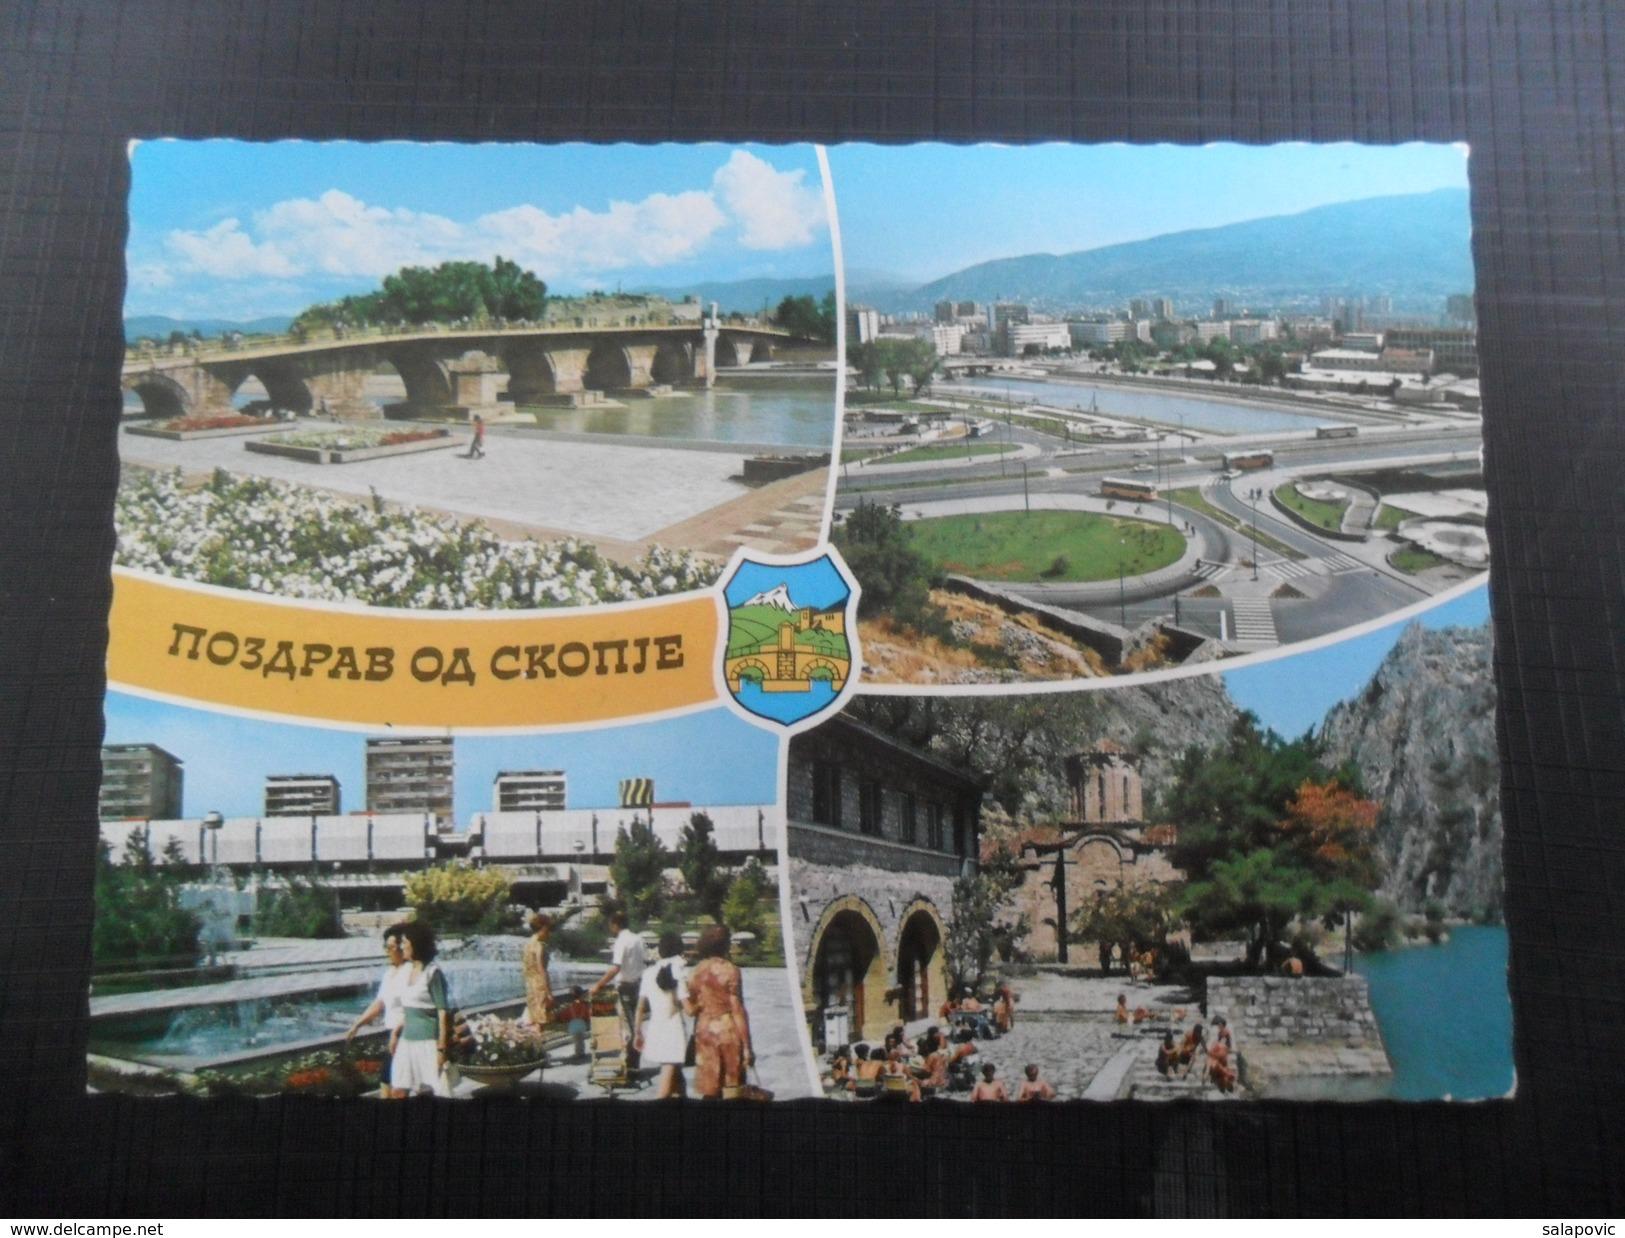 SKOPJE, MACEDONIA - Macedonia